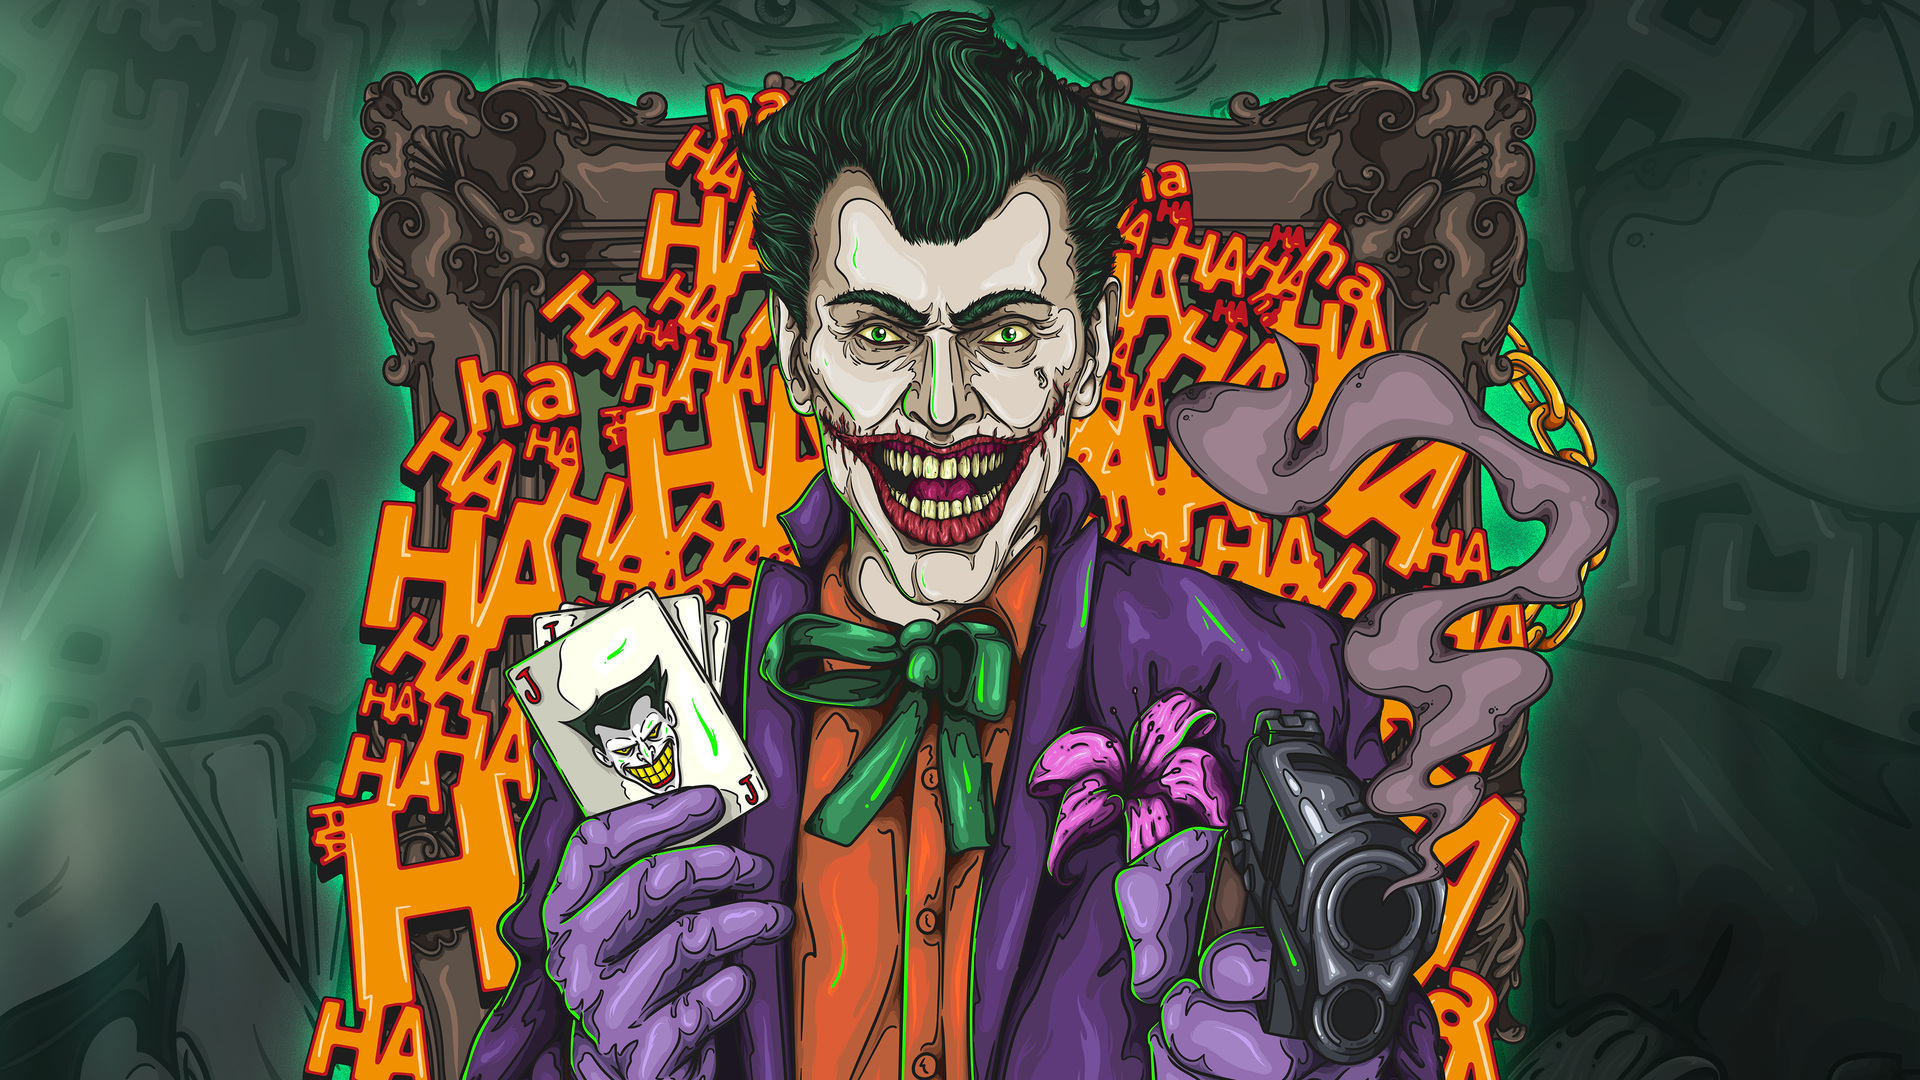 1920x1080 The Joker 4k Artwork Laptop Full HD 1080P HD 4k ...